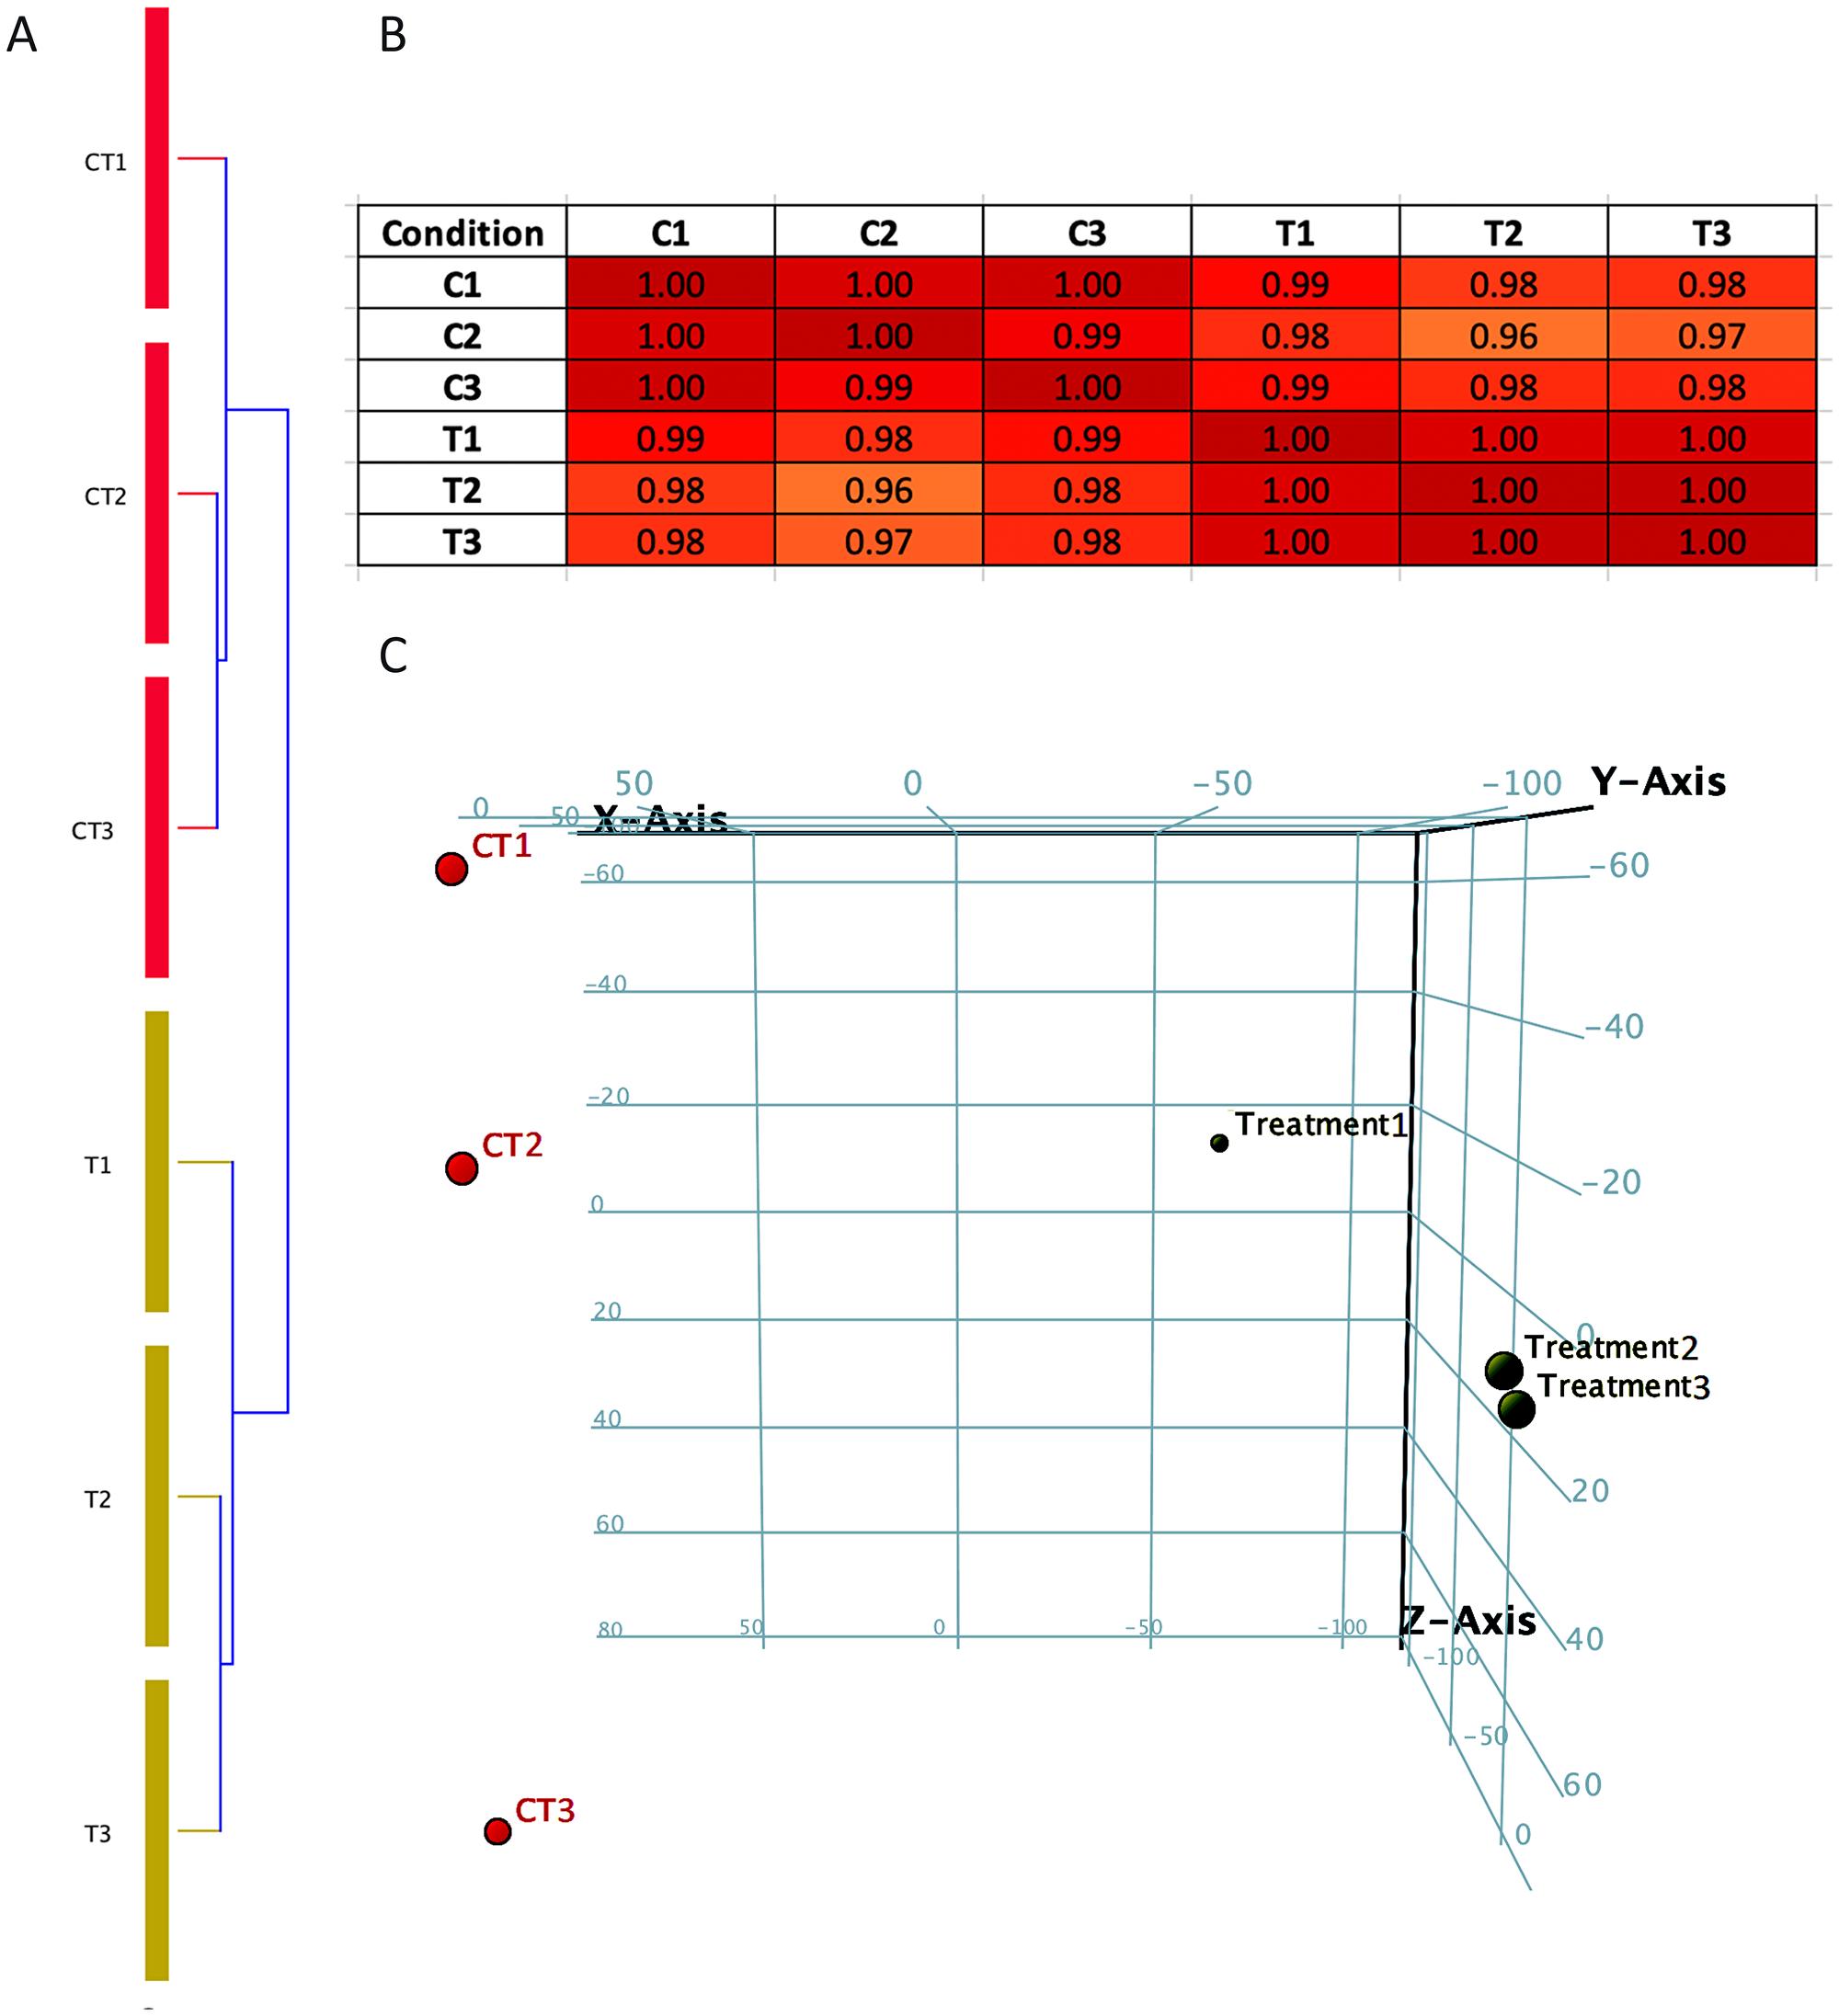 Condition tree, Correlation matrix and Principal component analysis (PCA plot).